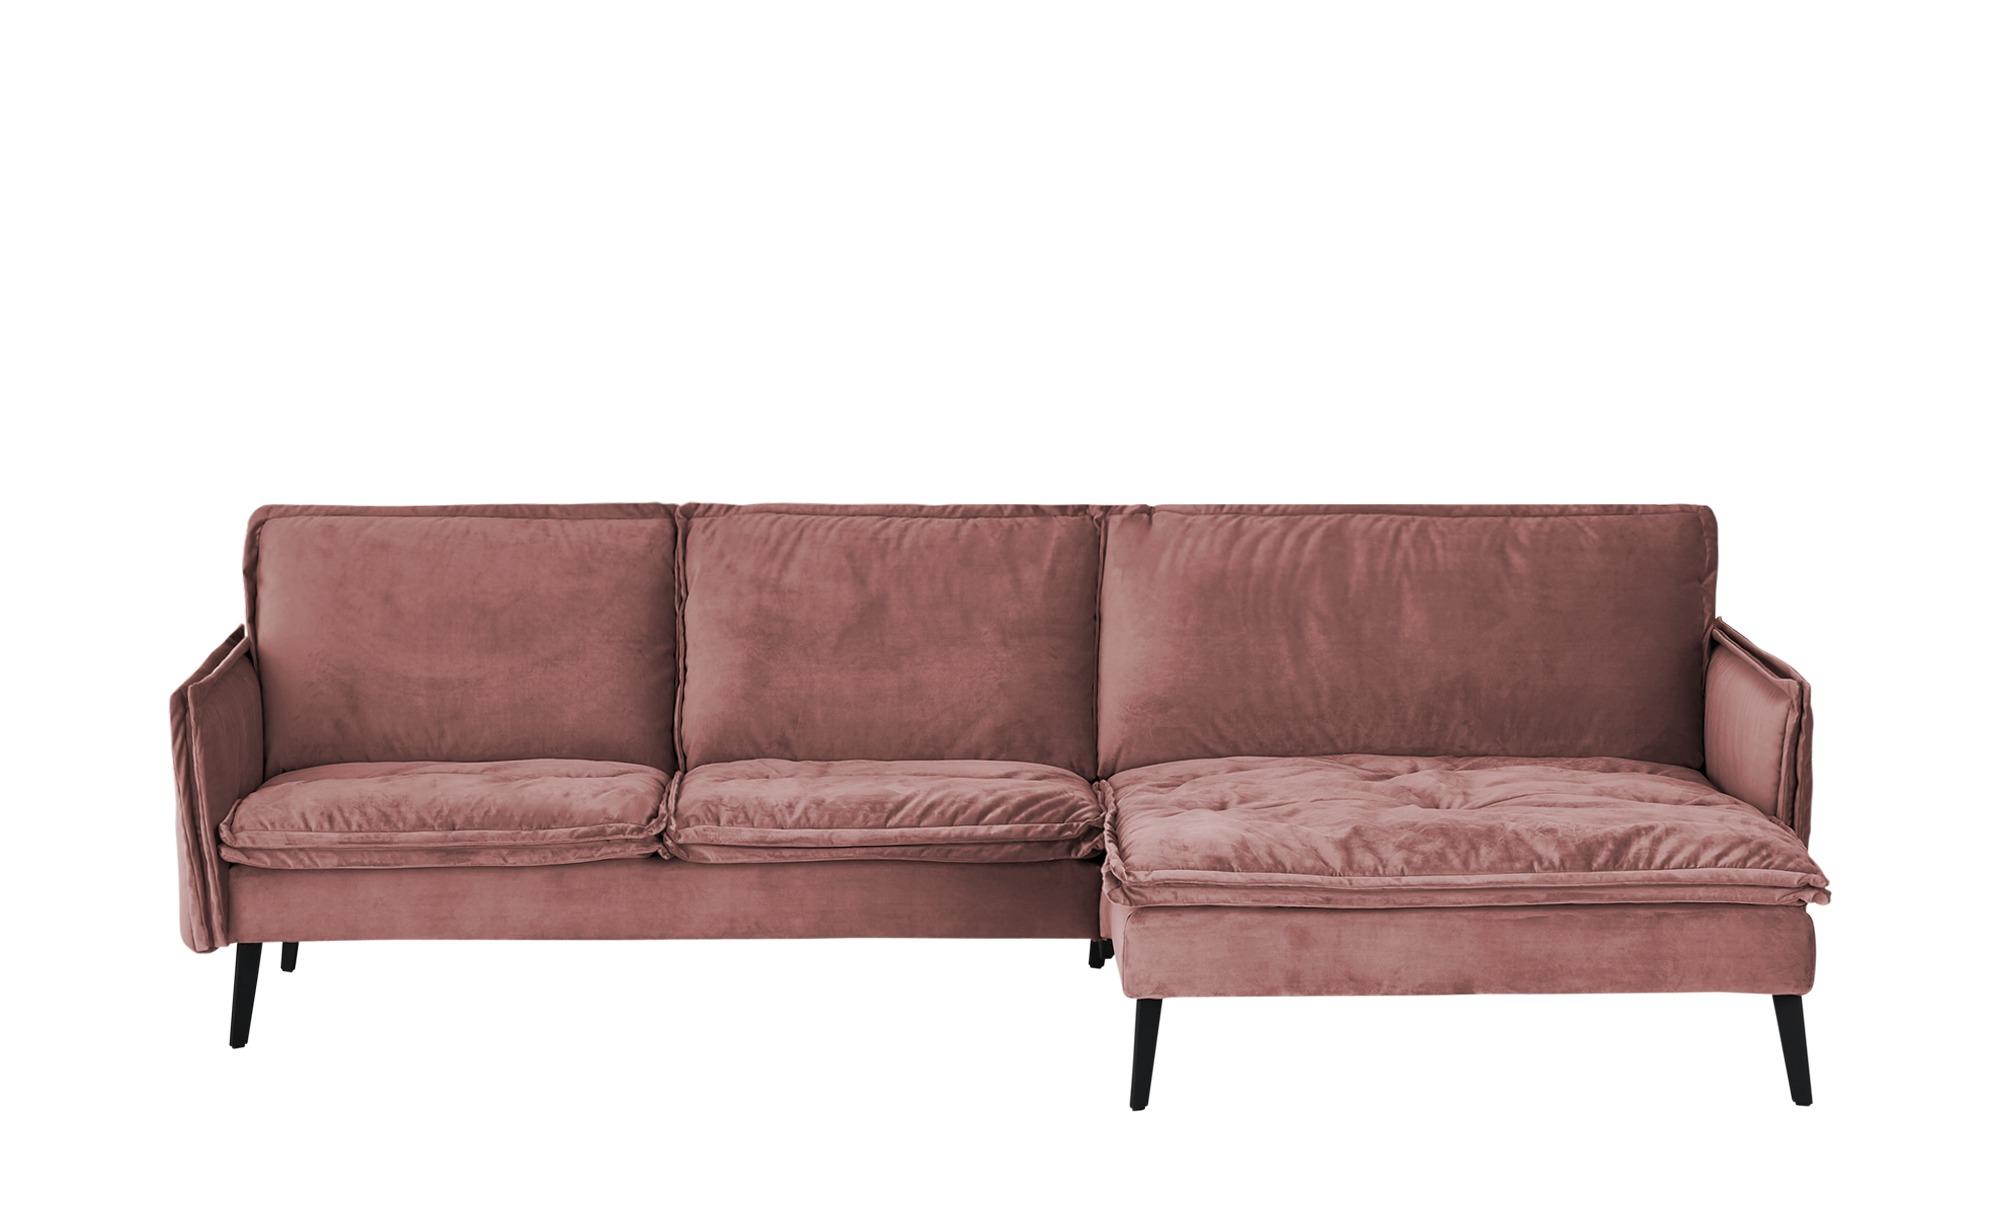 Musterring Ecksofa  Rahel ¦ rosa/pink ¦ Maße (cm): H: 94 Polstermöbel > Sofas > Ecksofas - Höffner